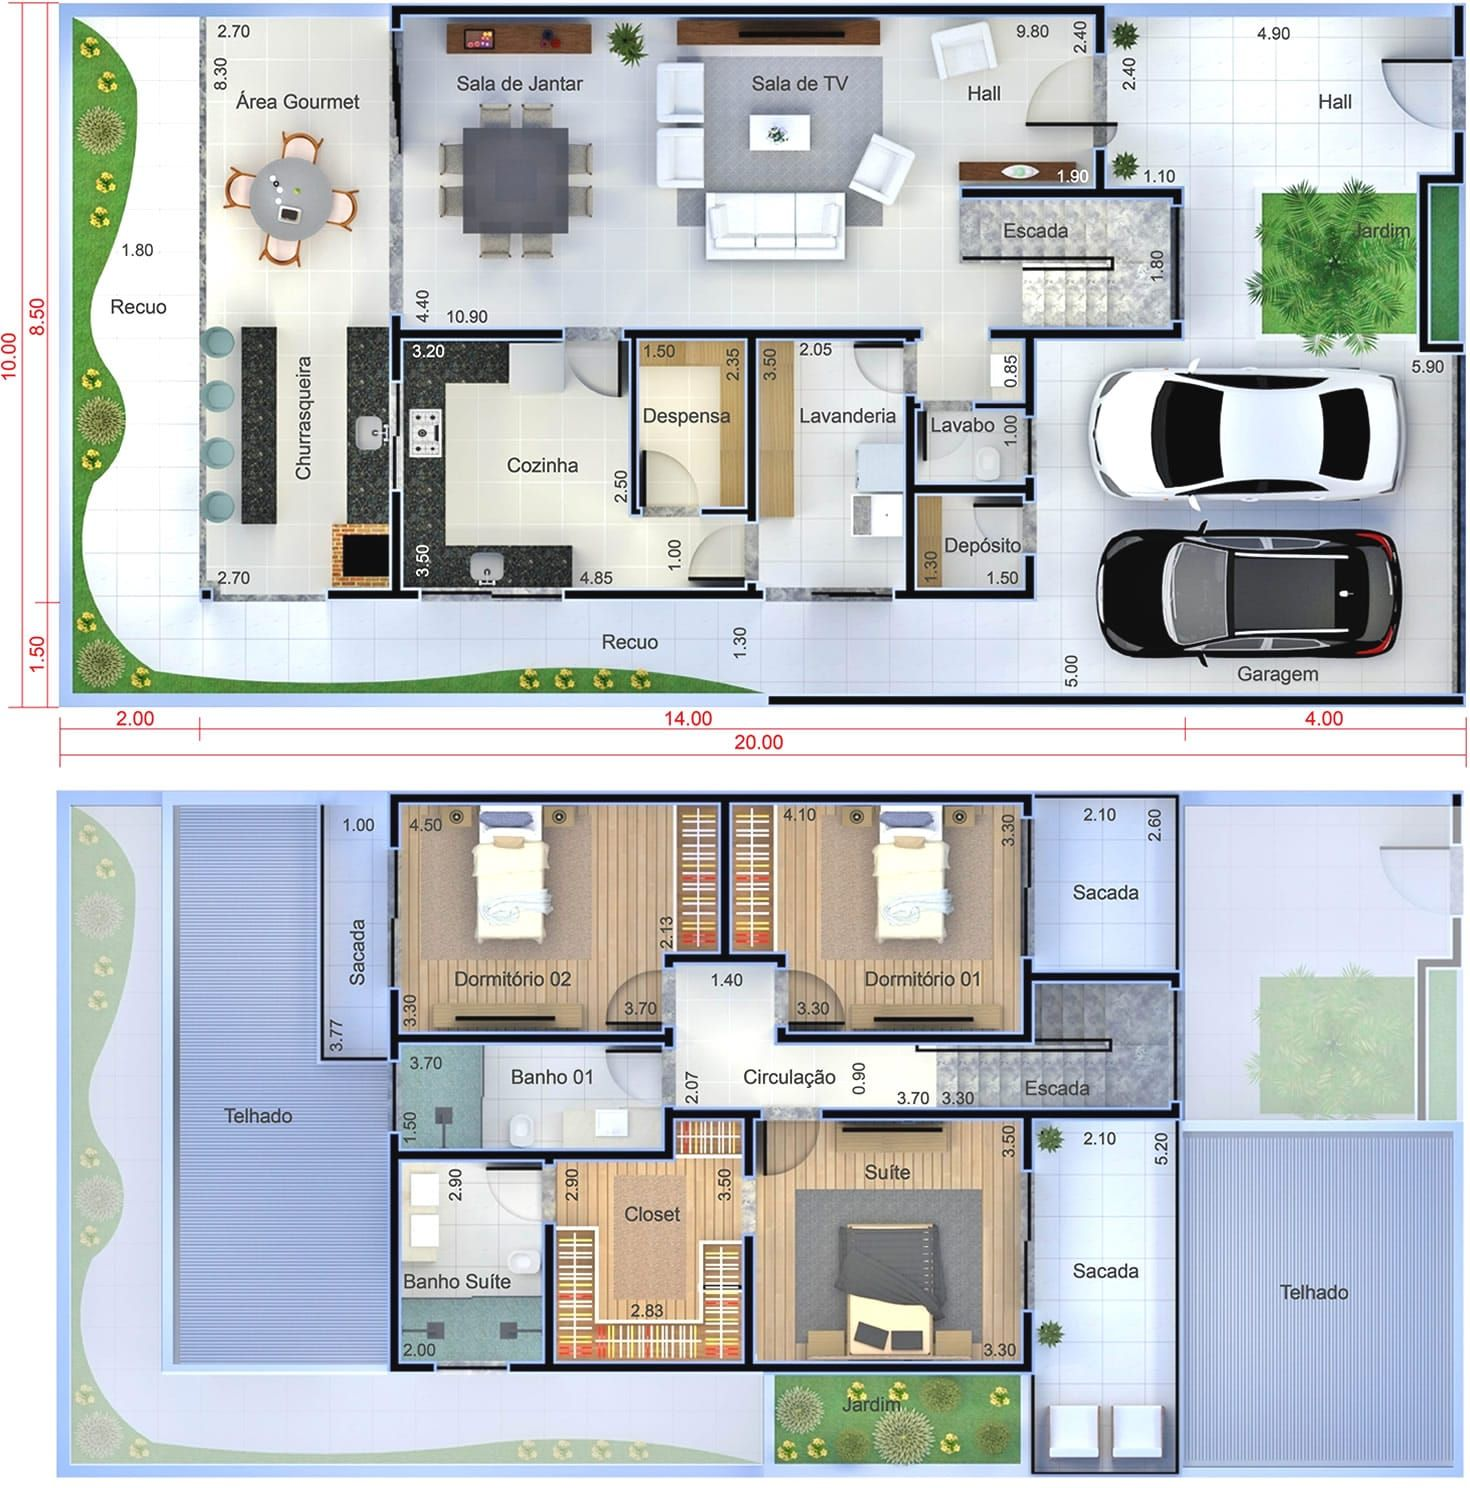 Planta de casa moderna con 3 dormitorios plano para for Planos de casas modernas de 3 dormitorios